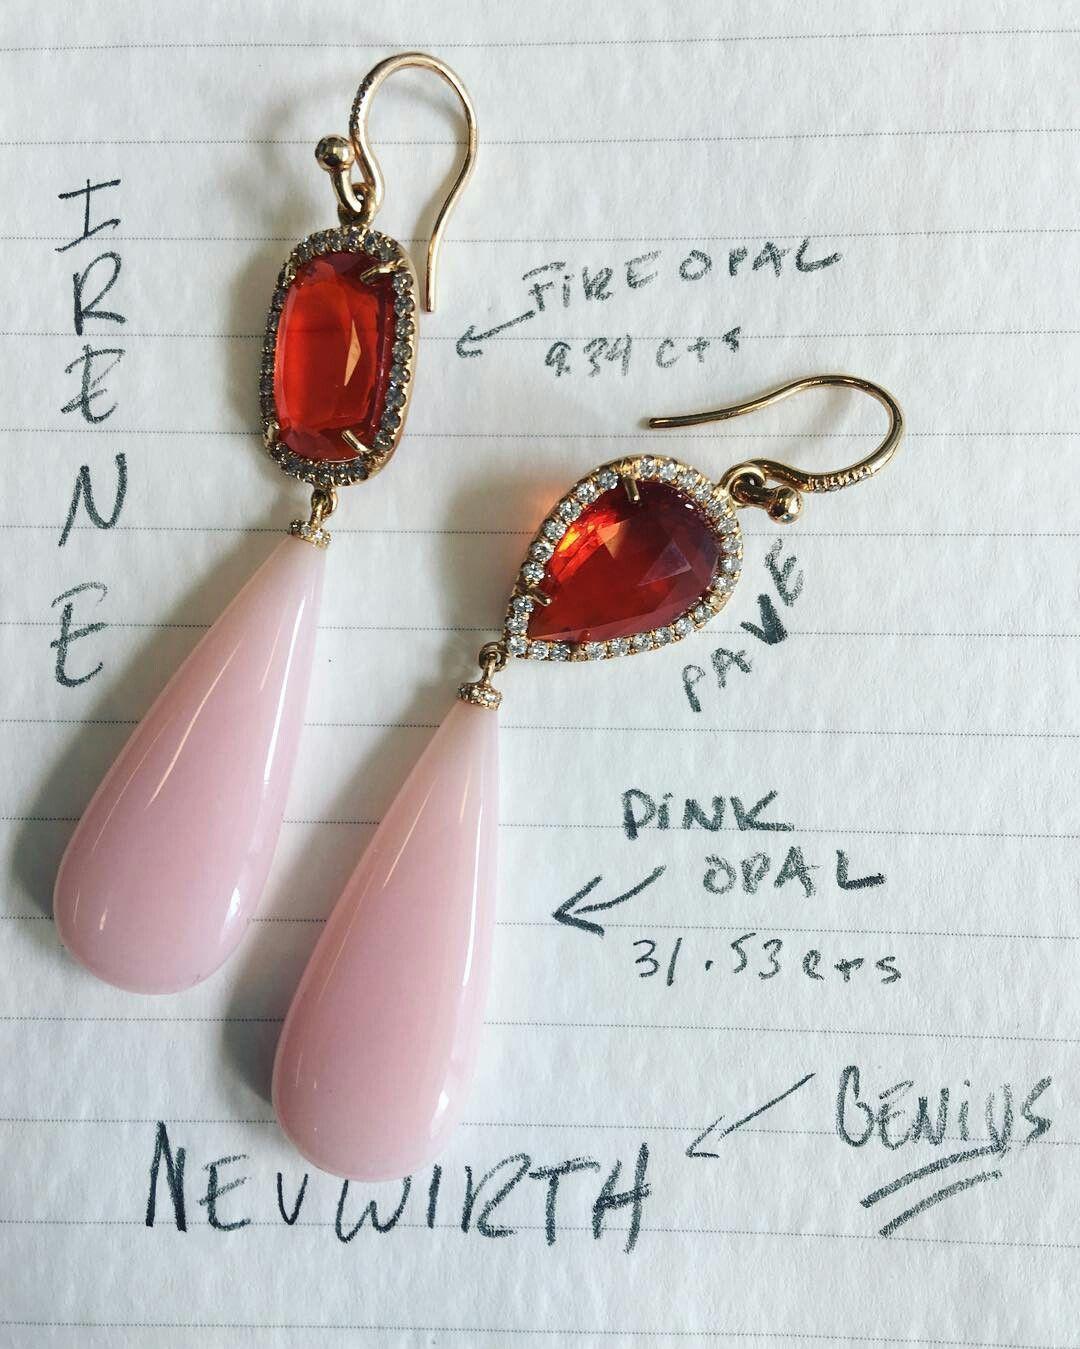 Jewel notes ireneneuwirth tandcjewels willsnotebook